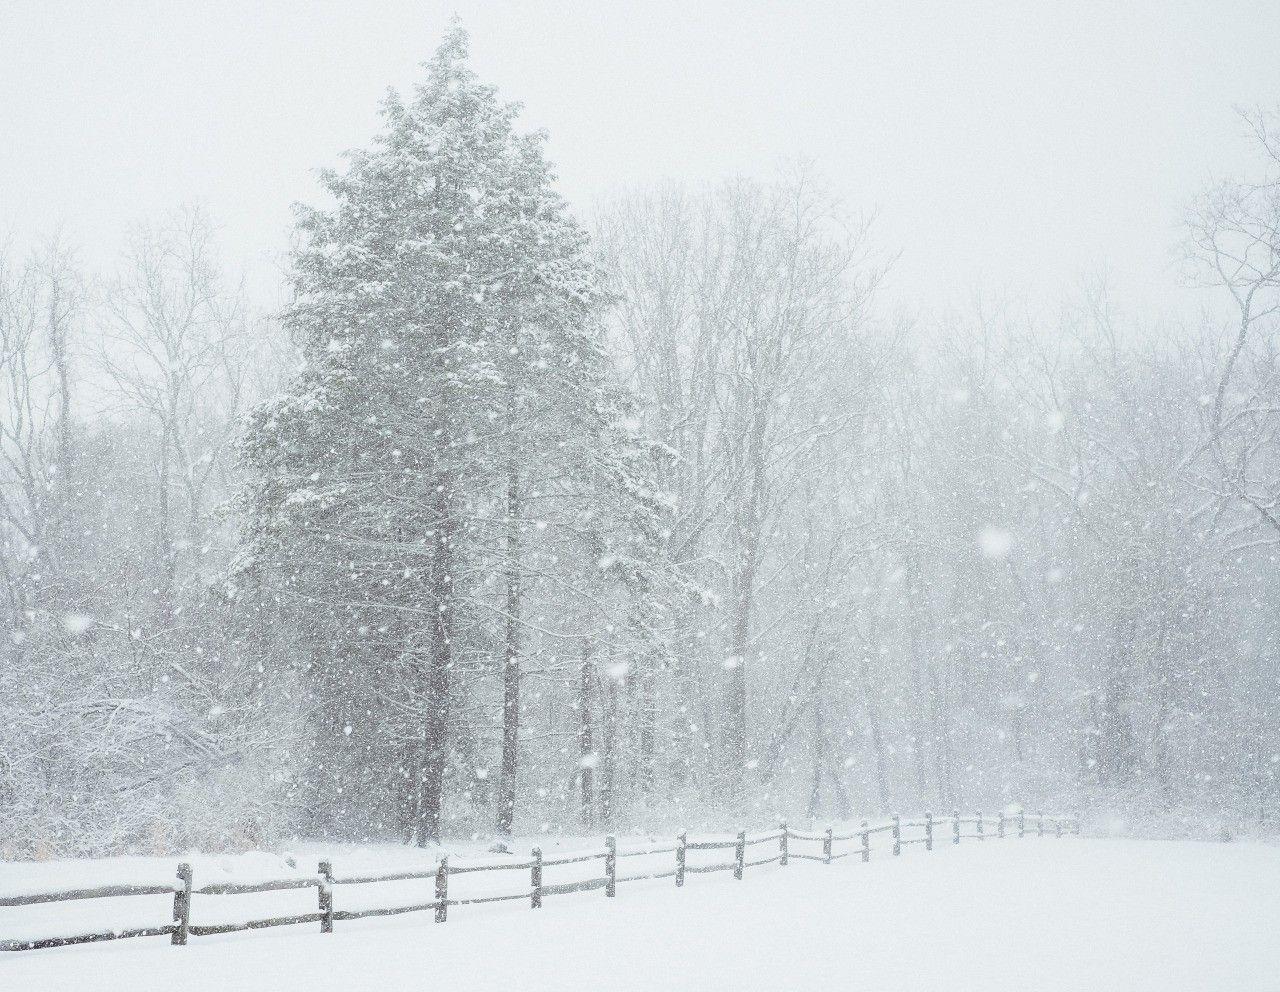 Wonderland Winter tumblr pictures catalog photo